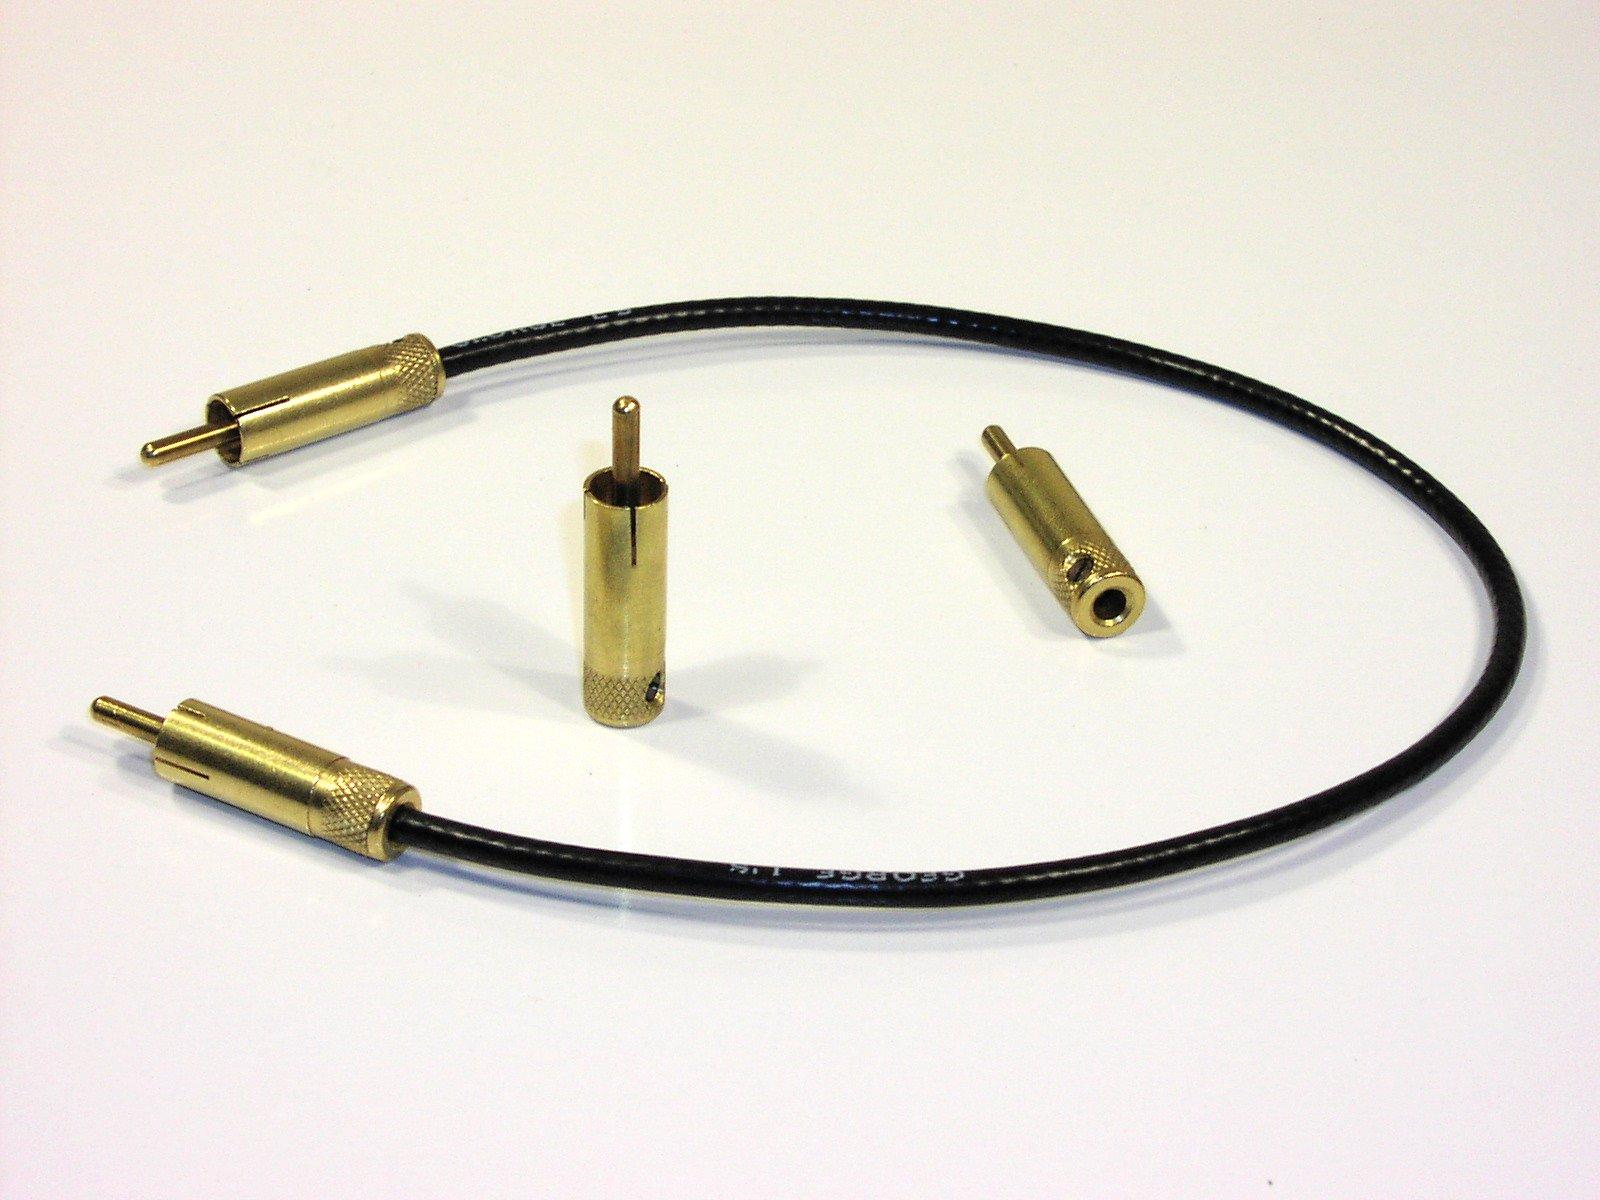 .155 George L's RCA Plug